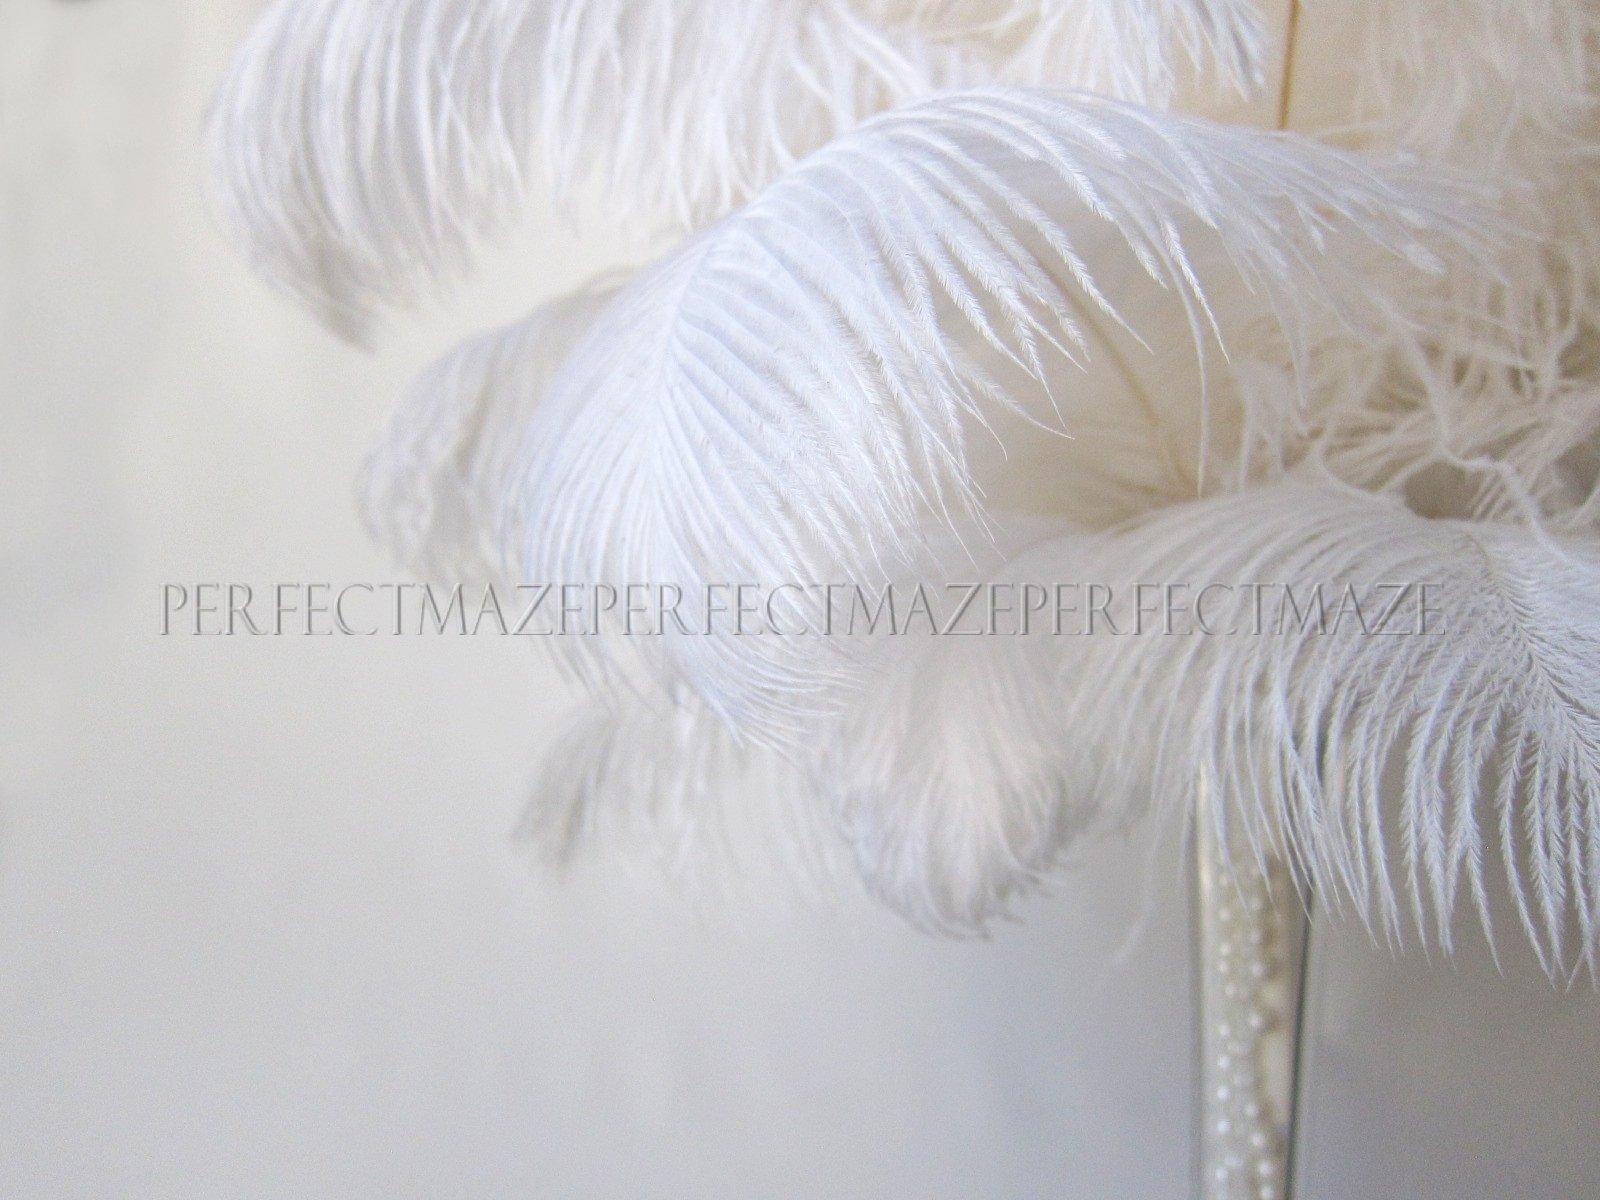 Perfectmaze 18''-20'' Ostrich Feather Premium Quality for Wedding Party Centerpiece Vase Decoration (100)